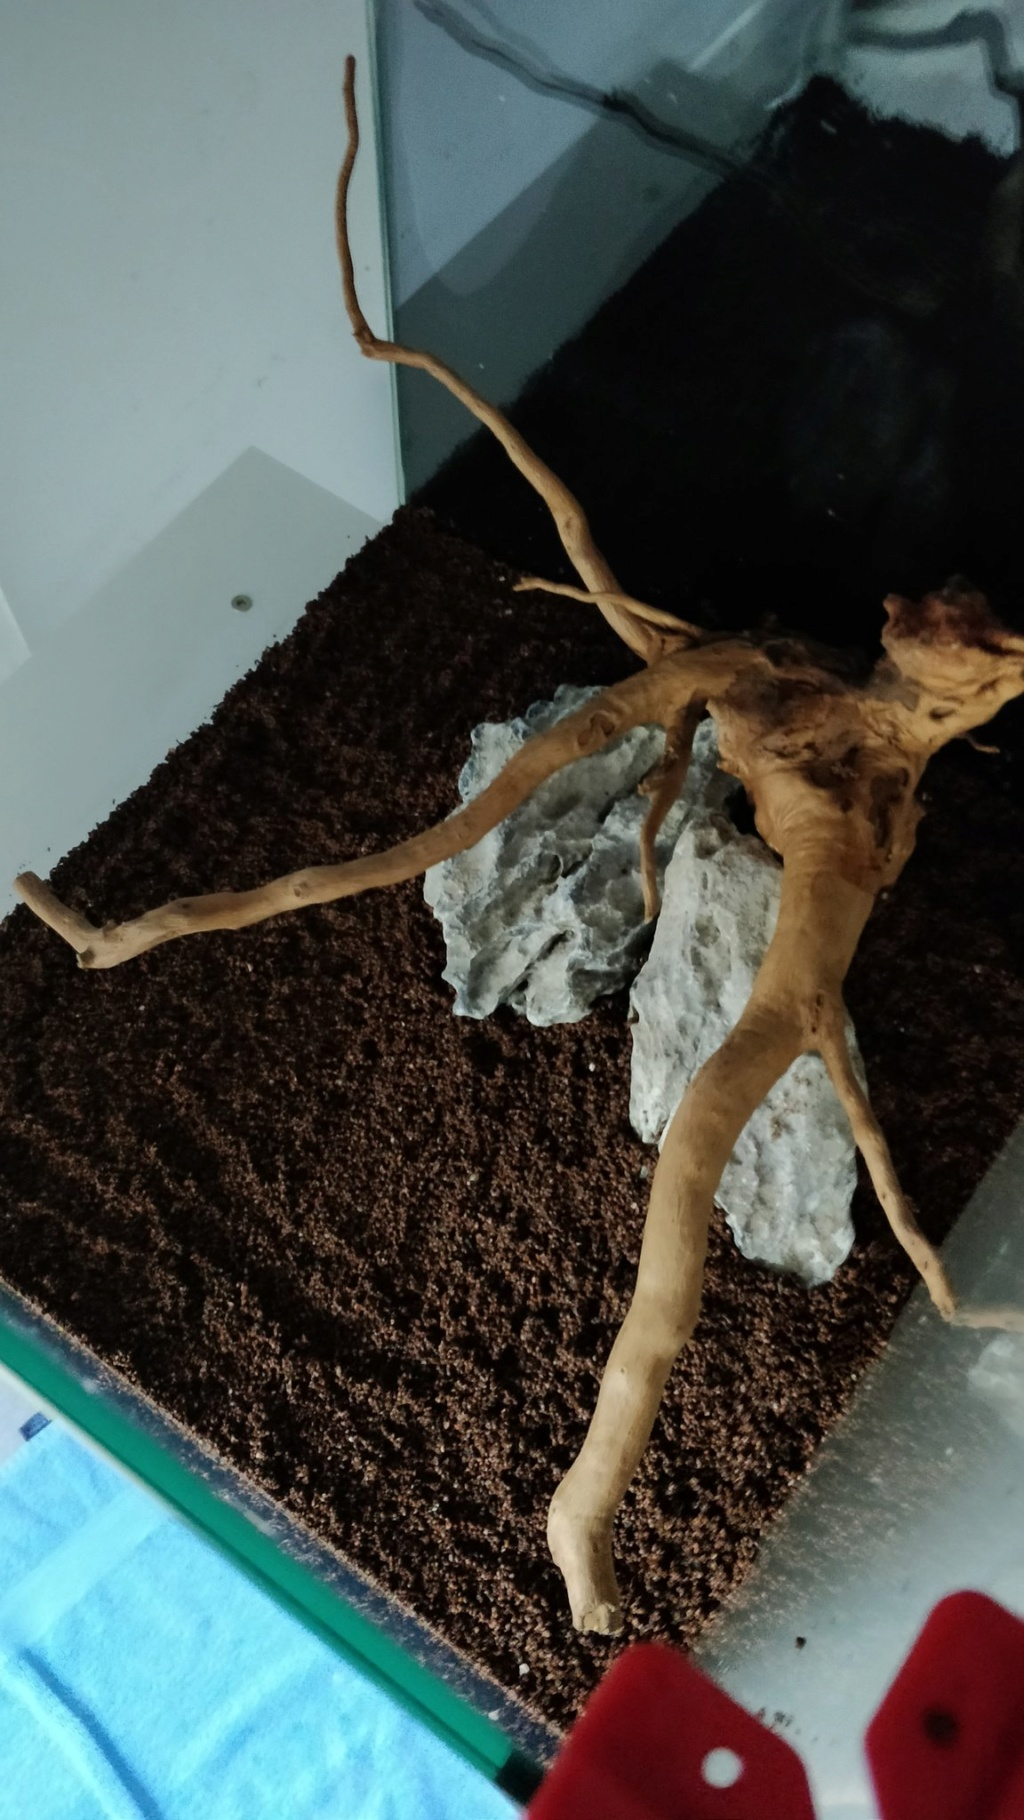 [2-Aquario] Bac 50L - Biotope Asiatique Ufqgsy10